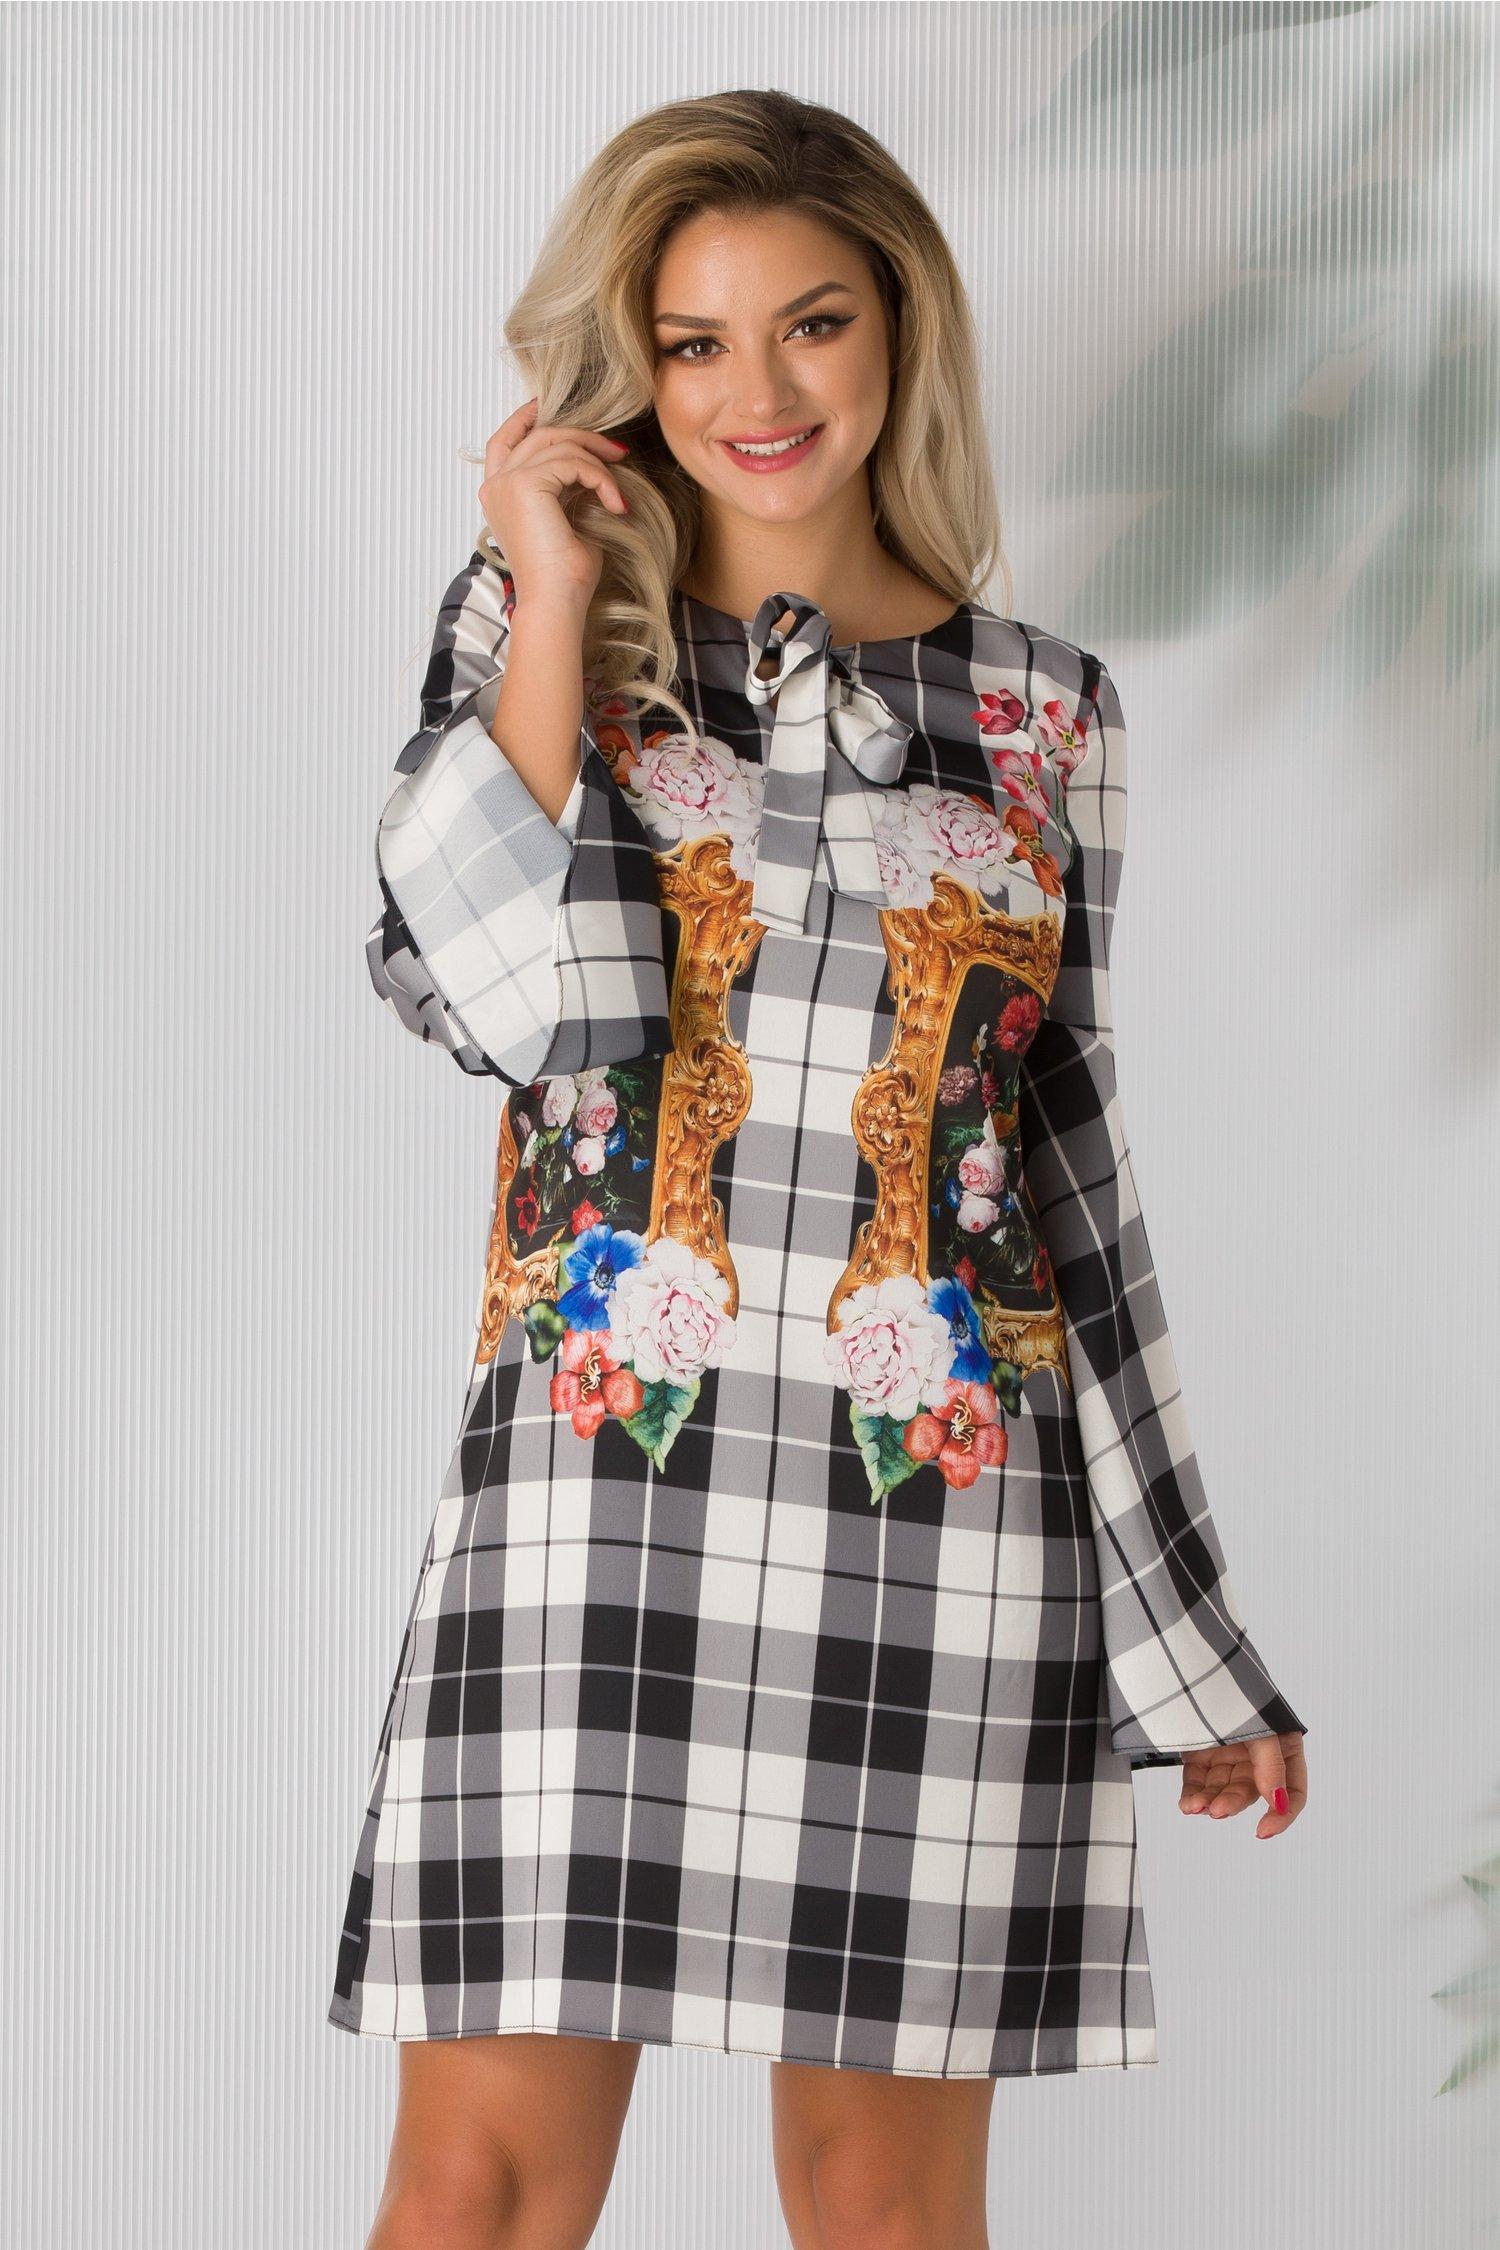 Rochie Helen cu carouri si imprimeuri florale